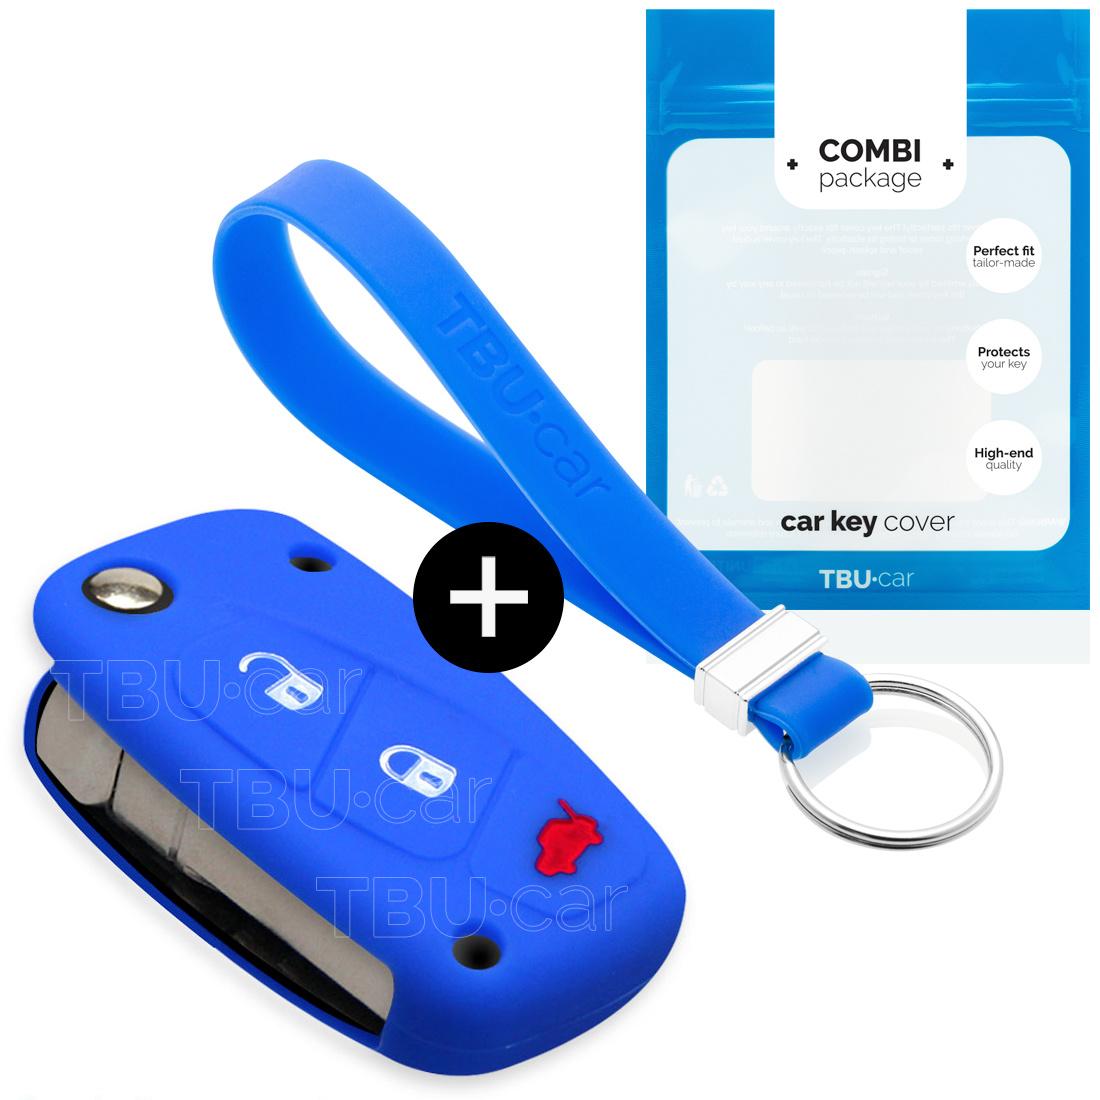 Lancia Autoschlüssel Hülle - Silikon Schutzhülle - Schlüsselhülle Cover - Blau